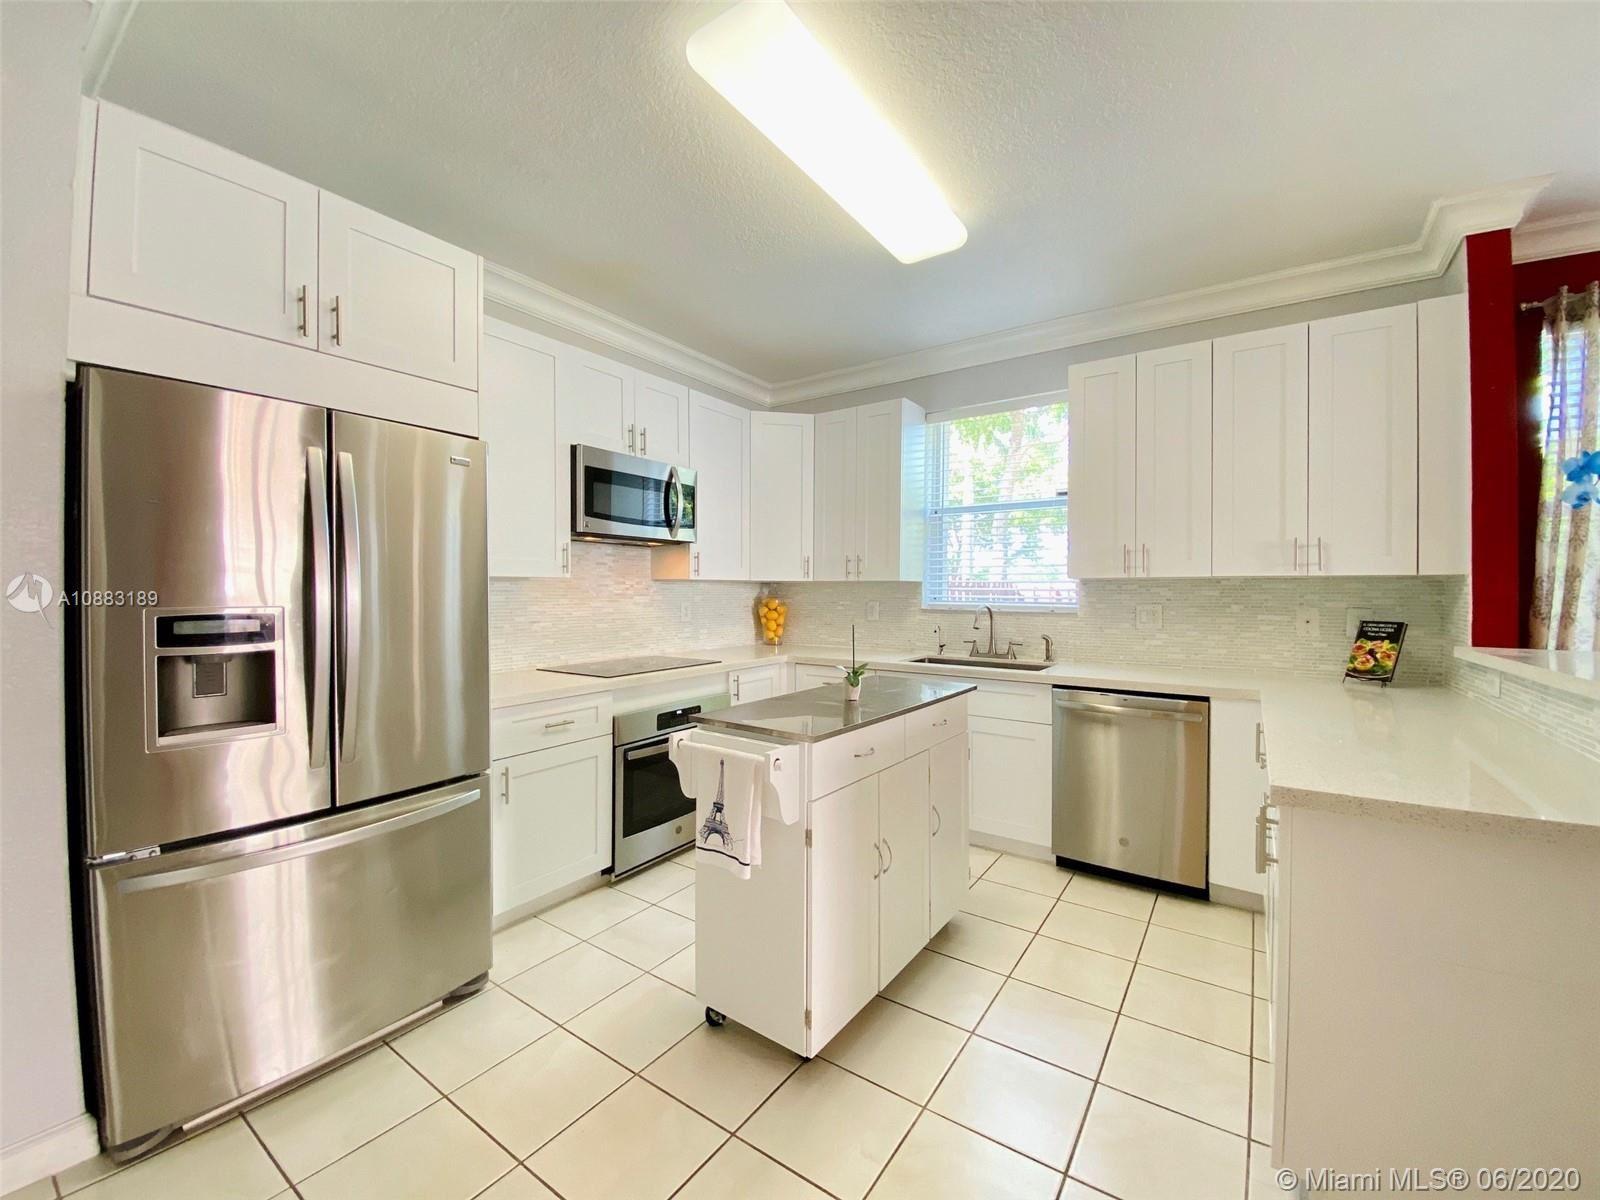 Photo of 21546 SW 92nd Pl, Cutler Bay, FL 33189 (MLS # A10883189)